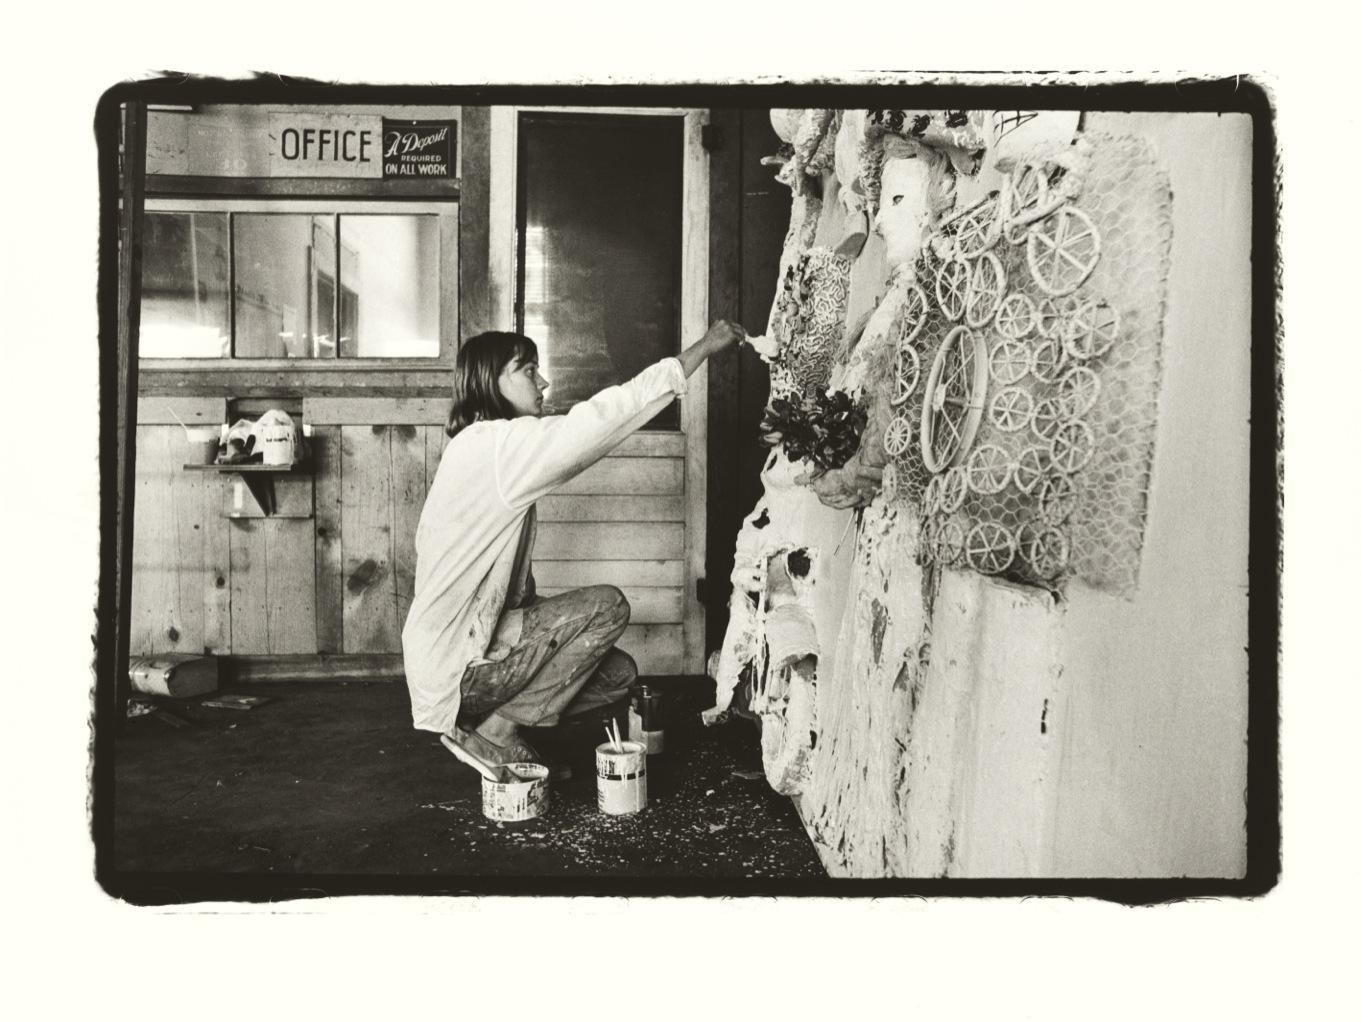 Niki de Saint Phalle_DH_1015_72dpi.jpg